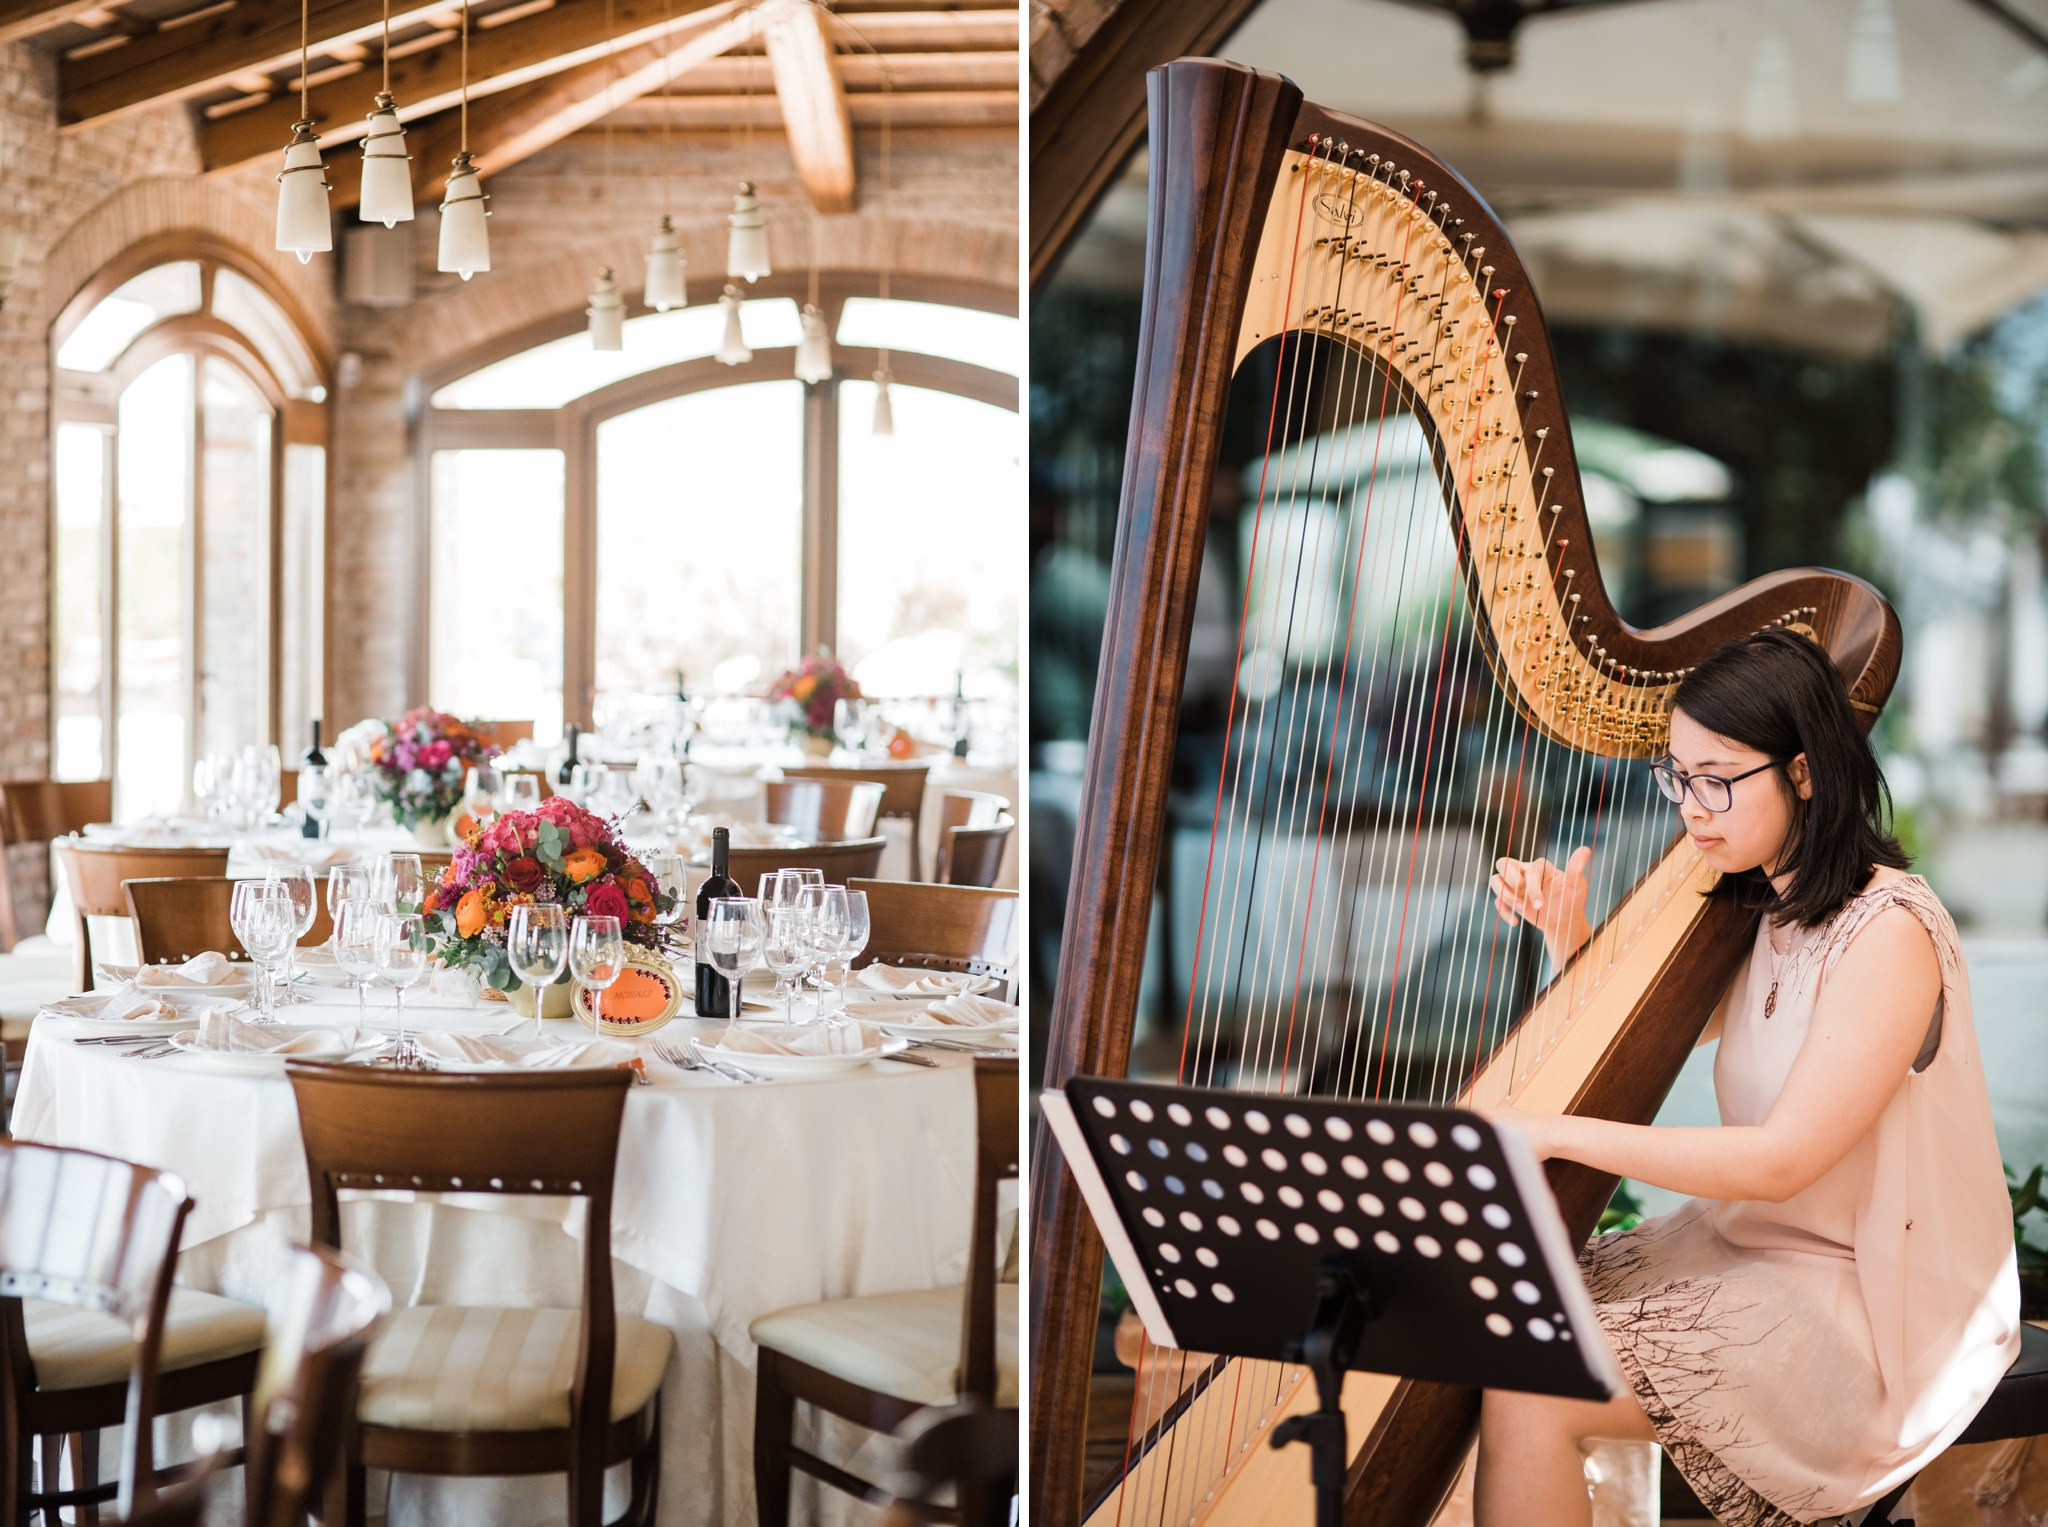 Harp Player Wedding Photographer Italy